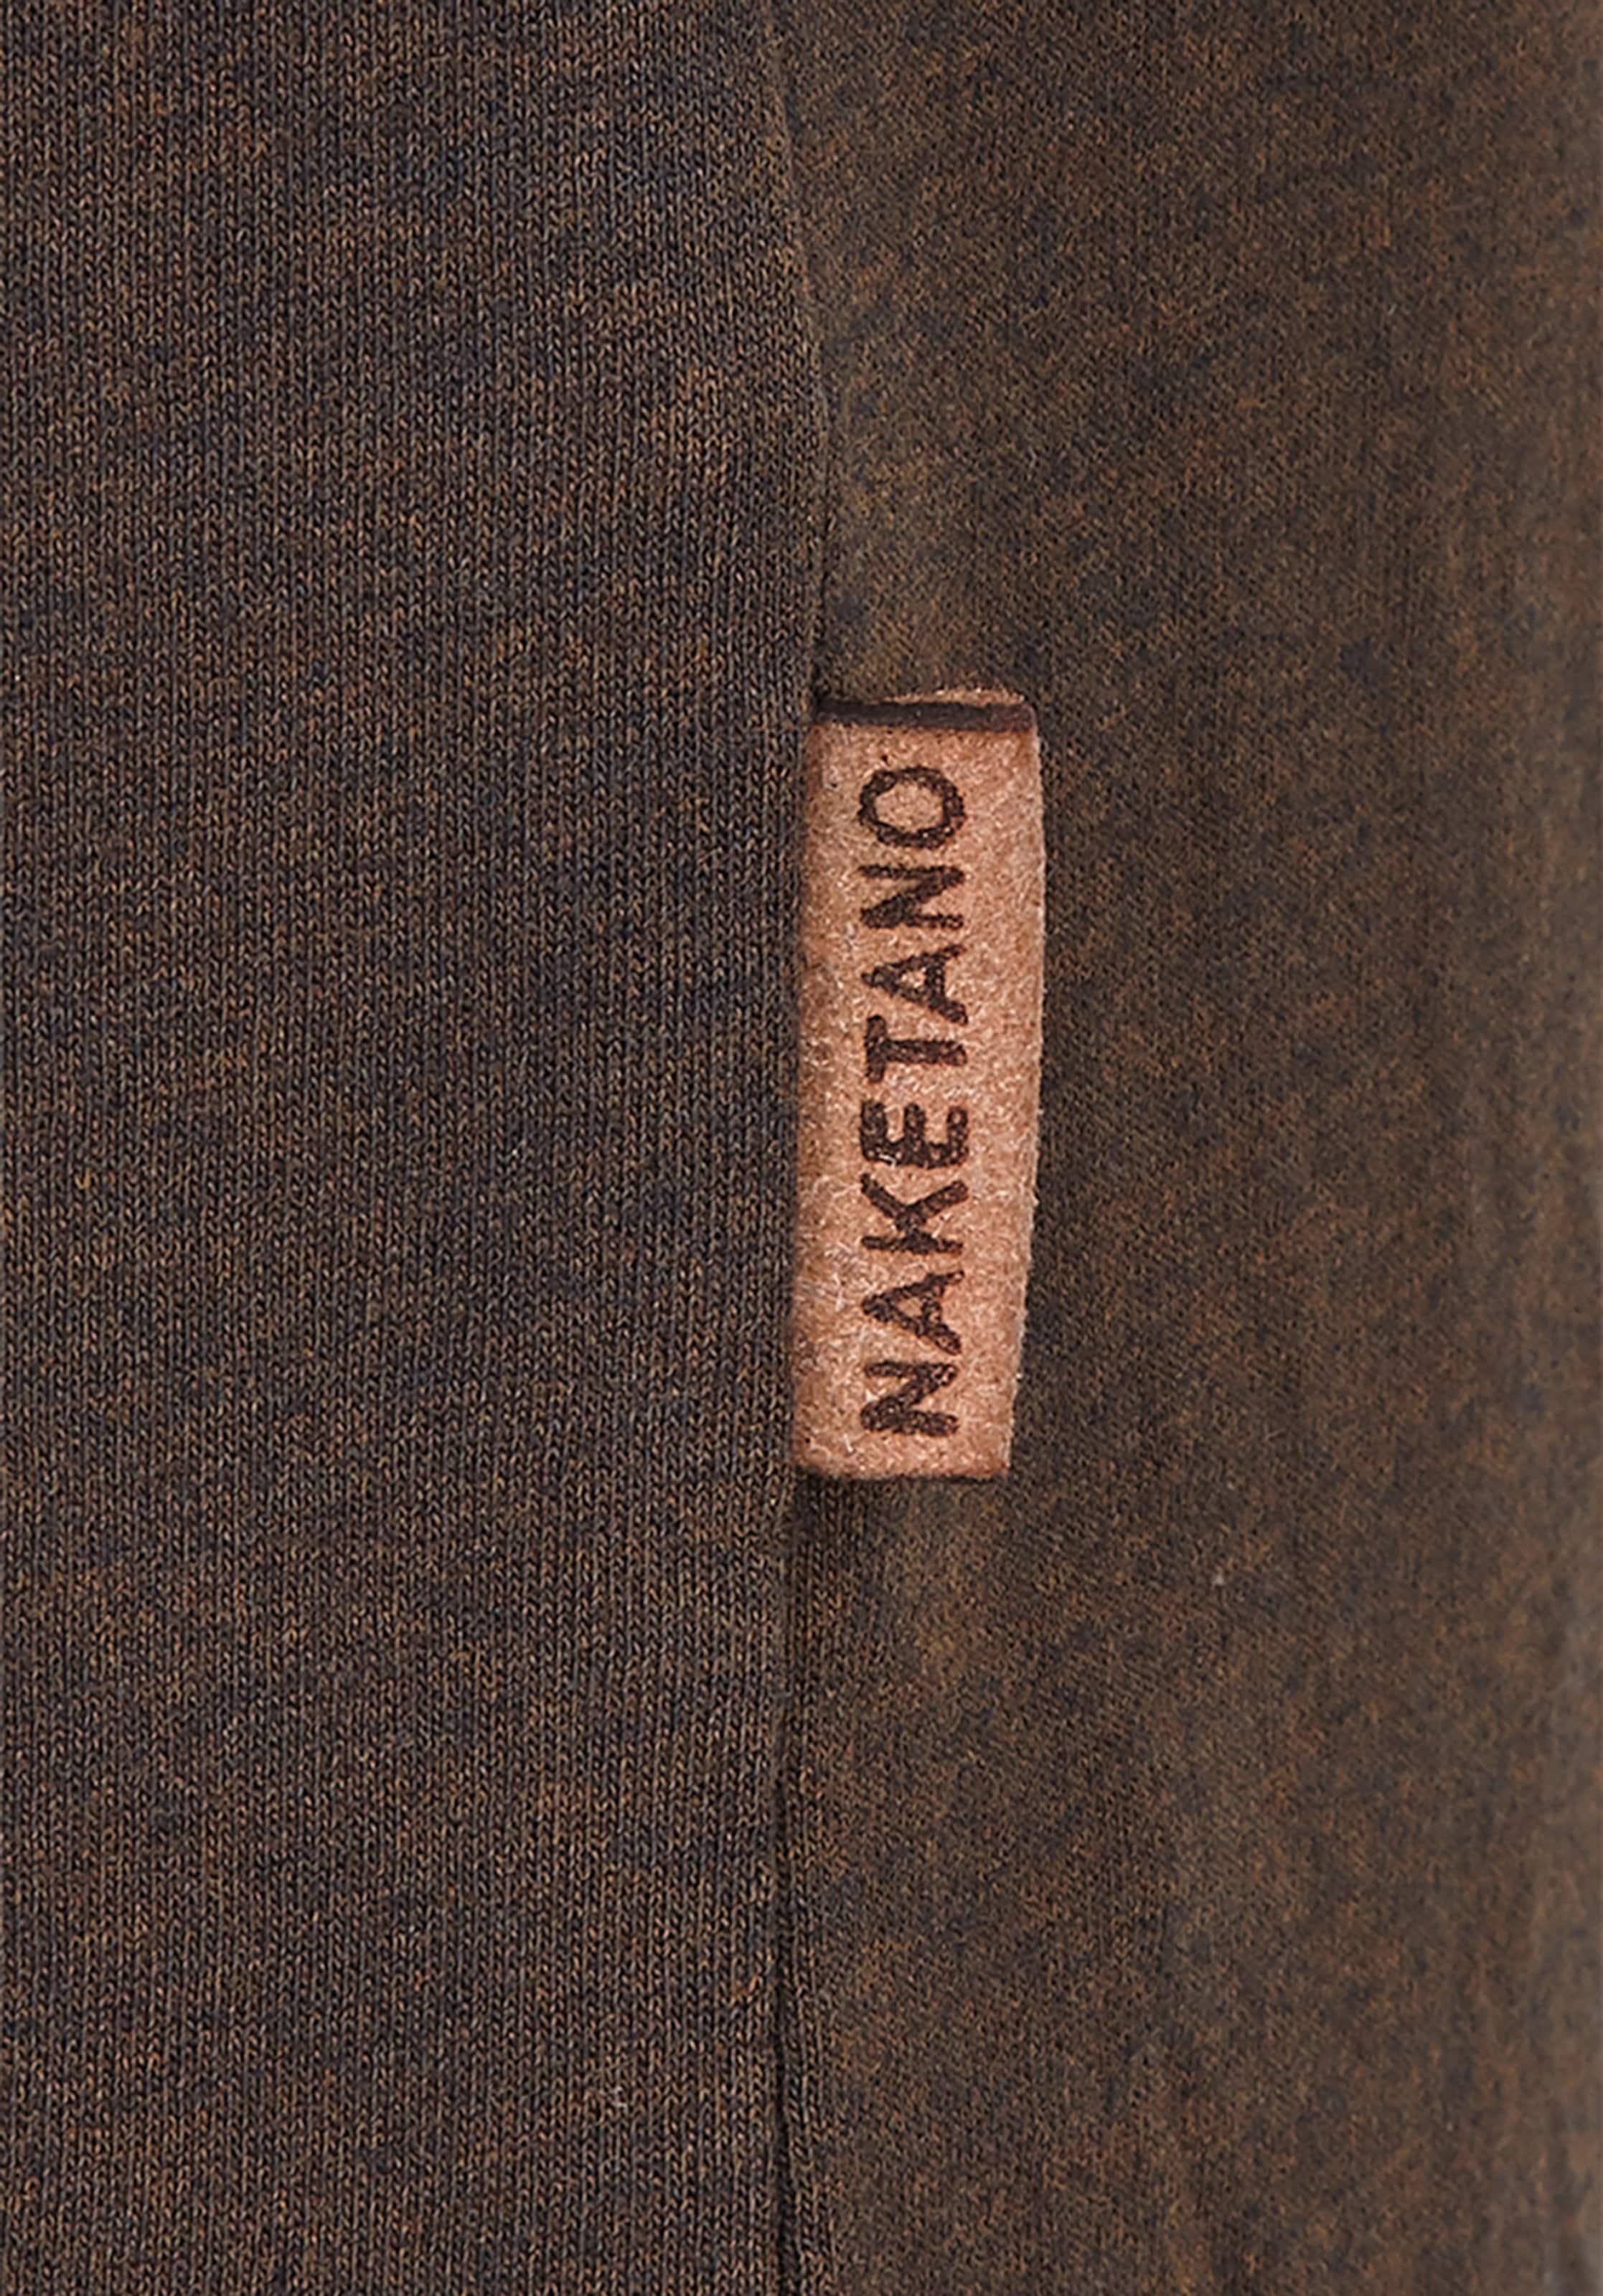 Leben' Traum T Marron Chiné Mein shirt En Naketano 'mir eIWDEH9Y2b